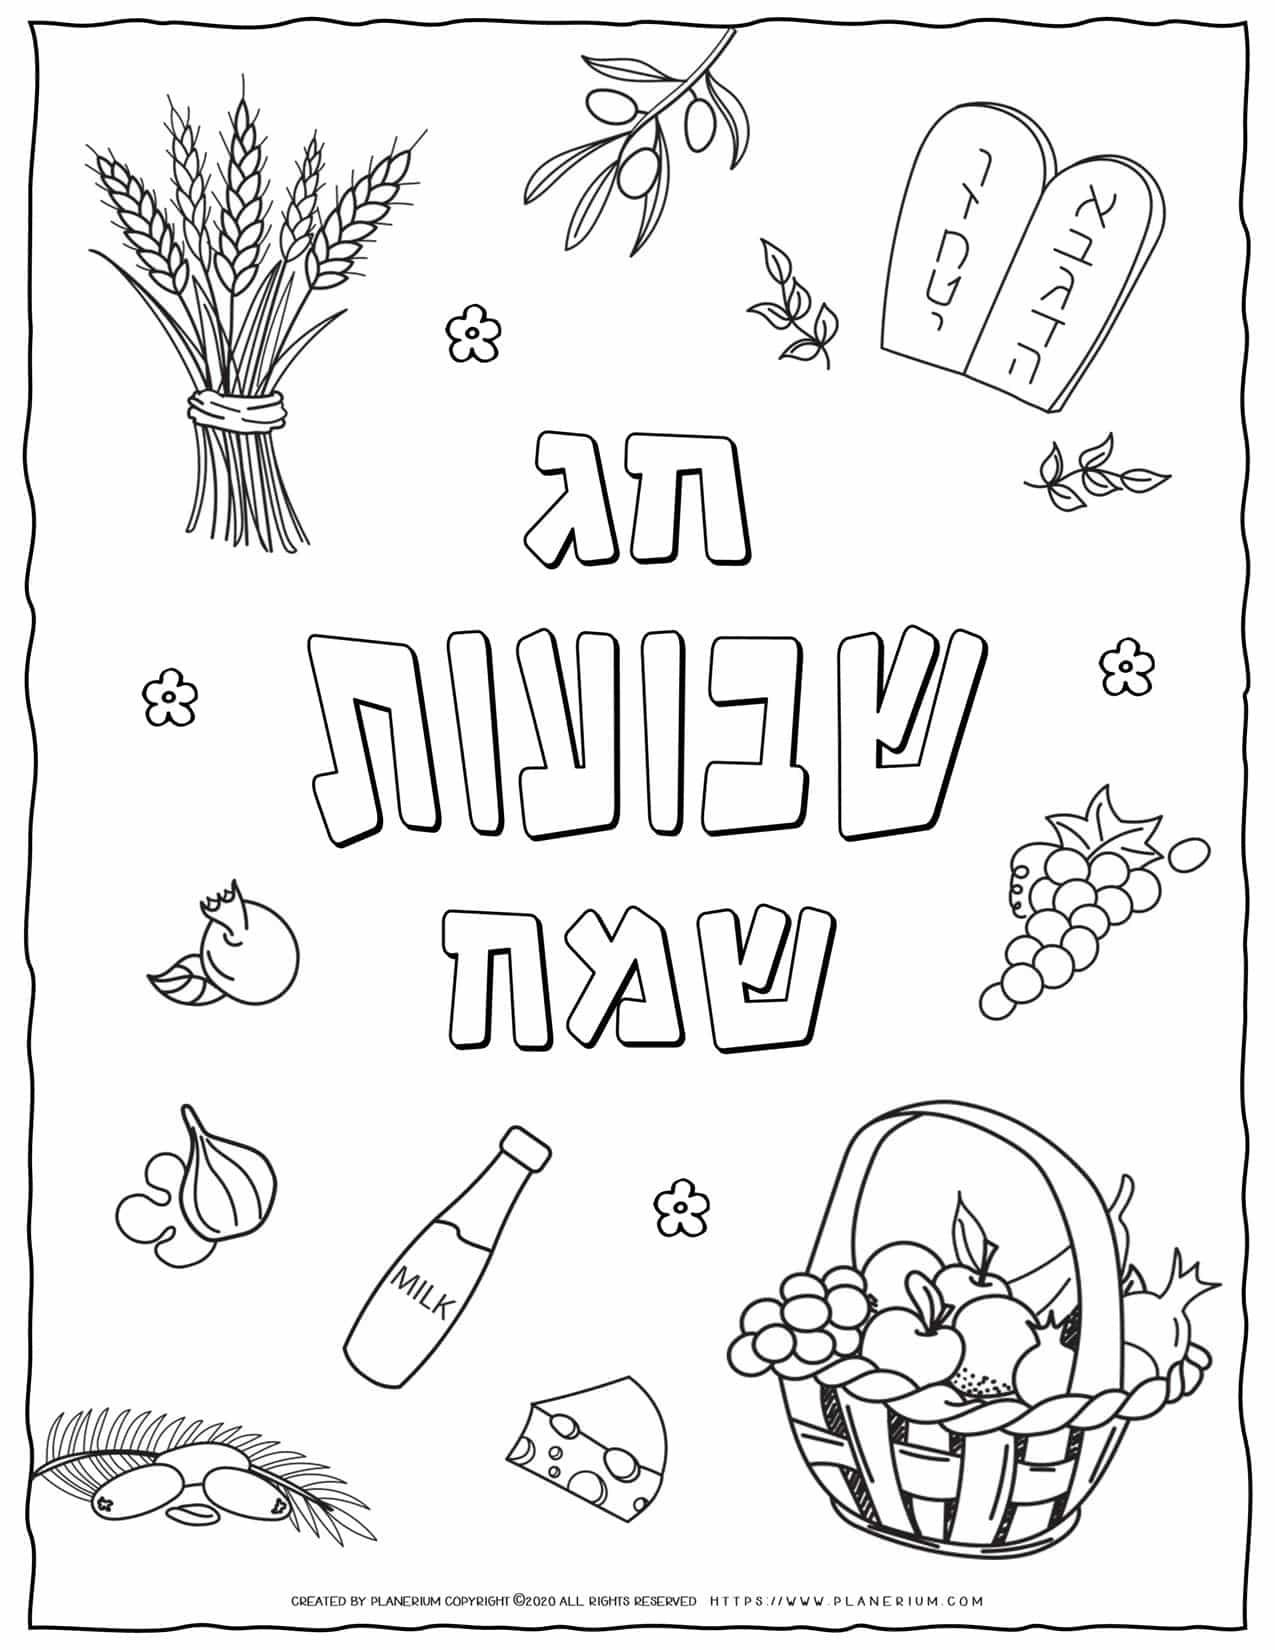 Shavuot Coloring Page - Happy Shavuot in Hebrew | Planerium